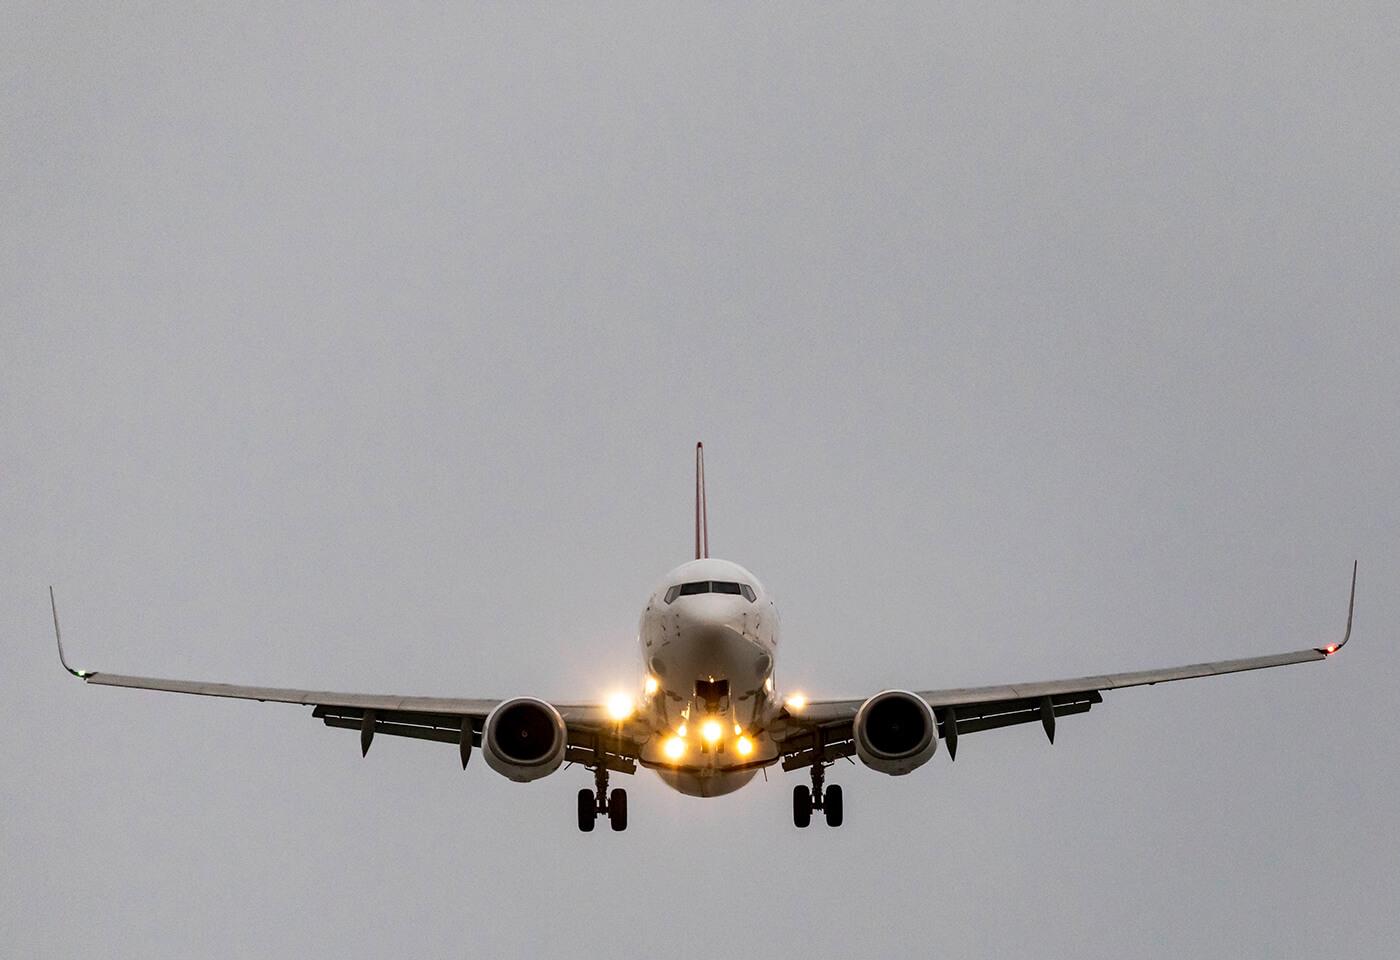 Image of Qantas airplane by Steve Huddy